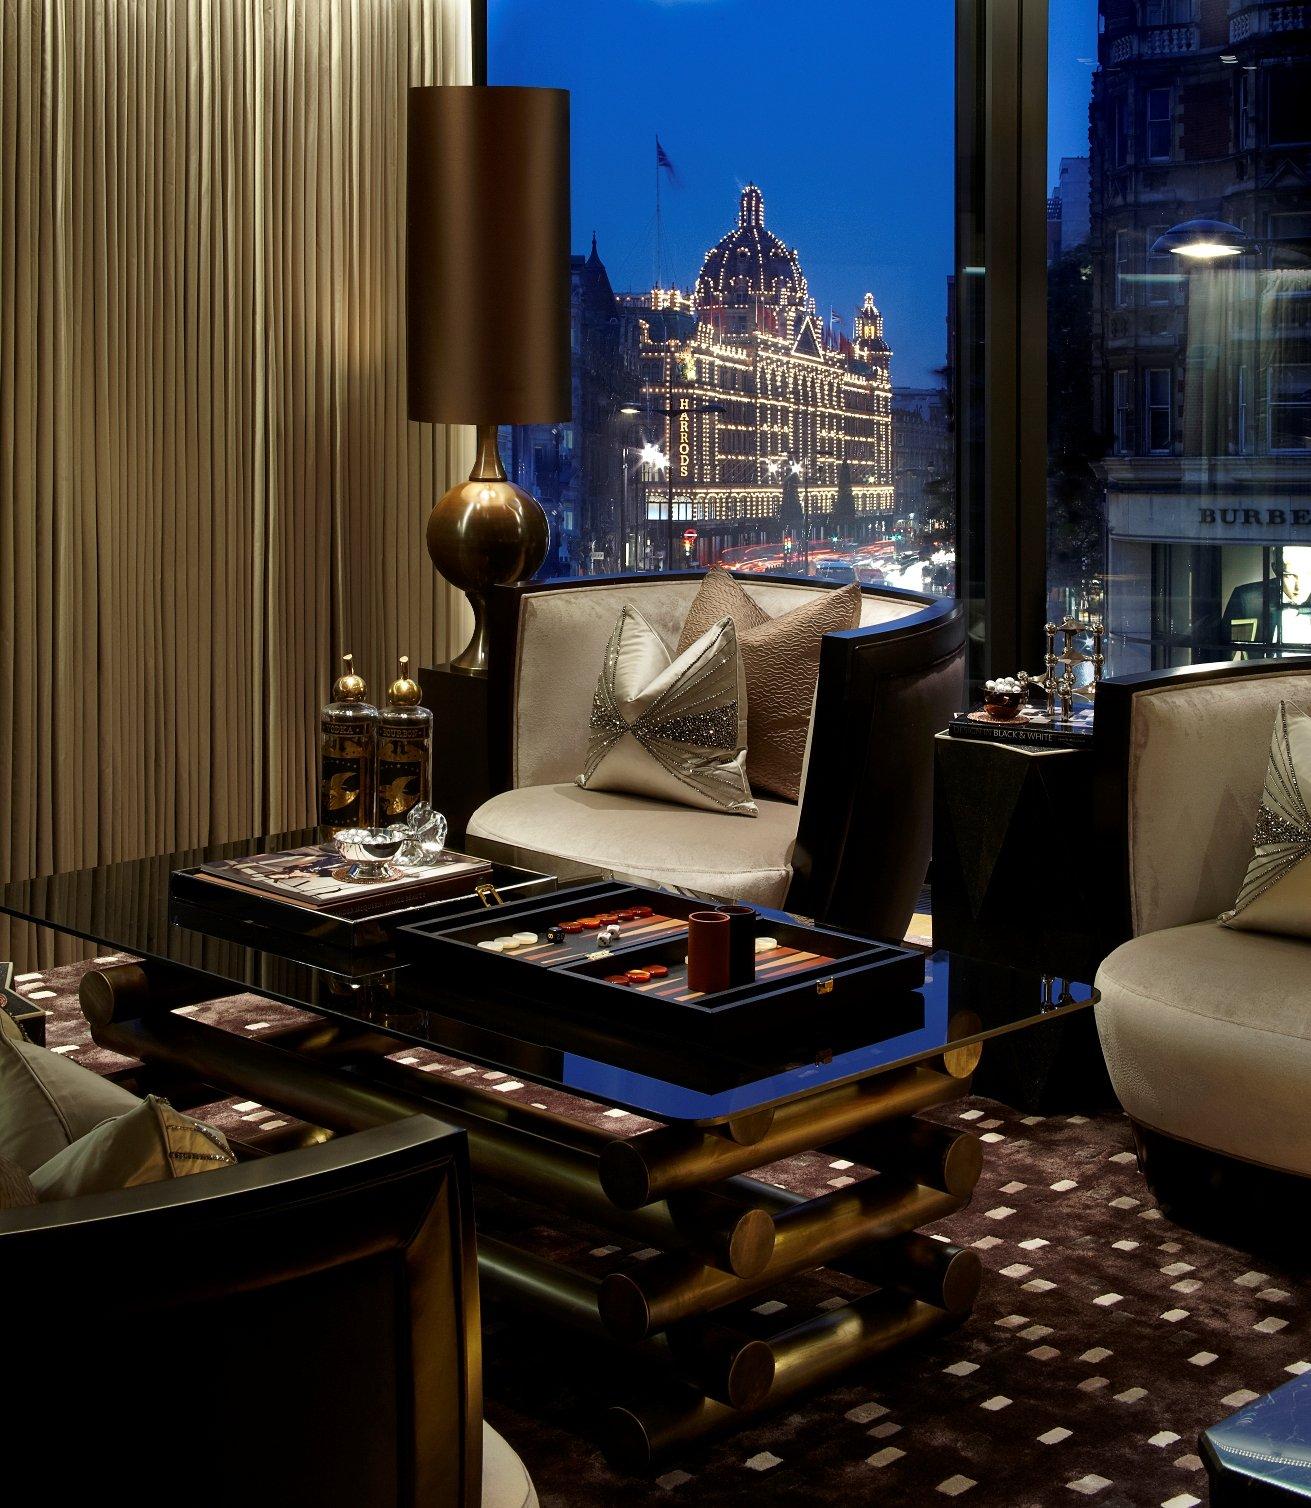 One Bedroom Apartment London Rent: Darling Associates